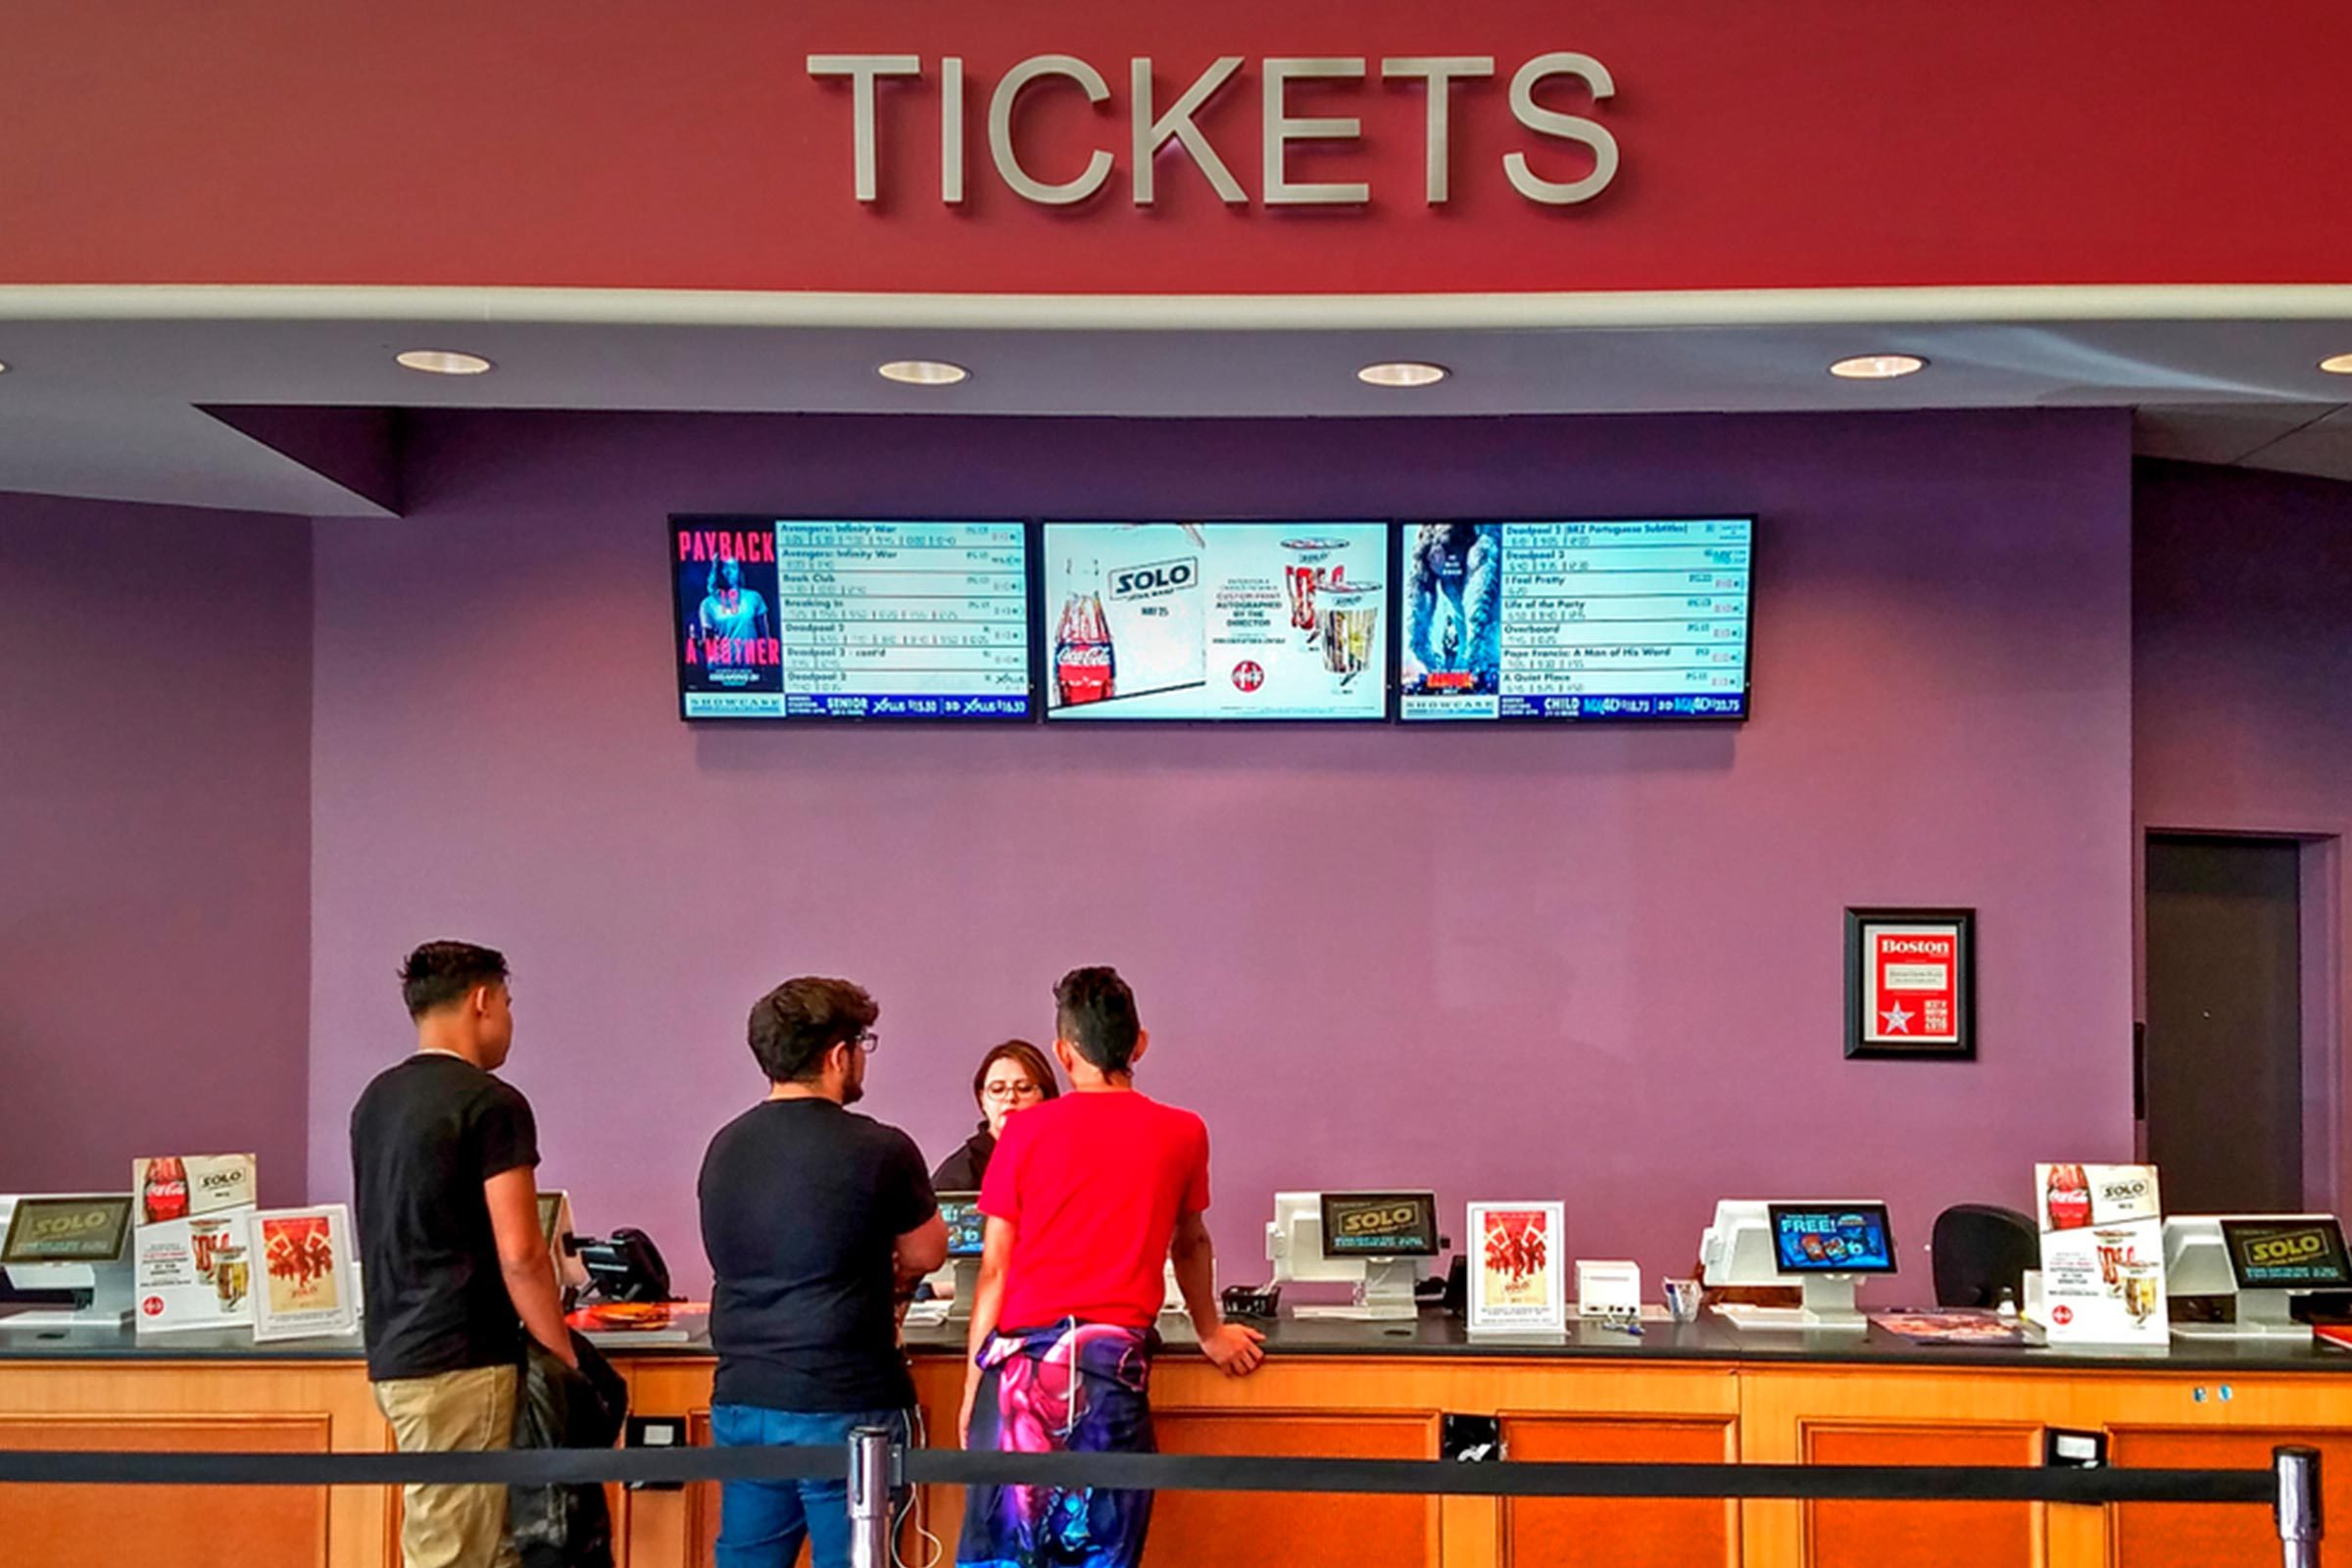 Movie theater tickets